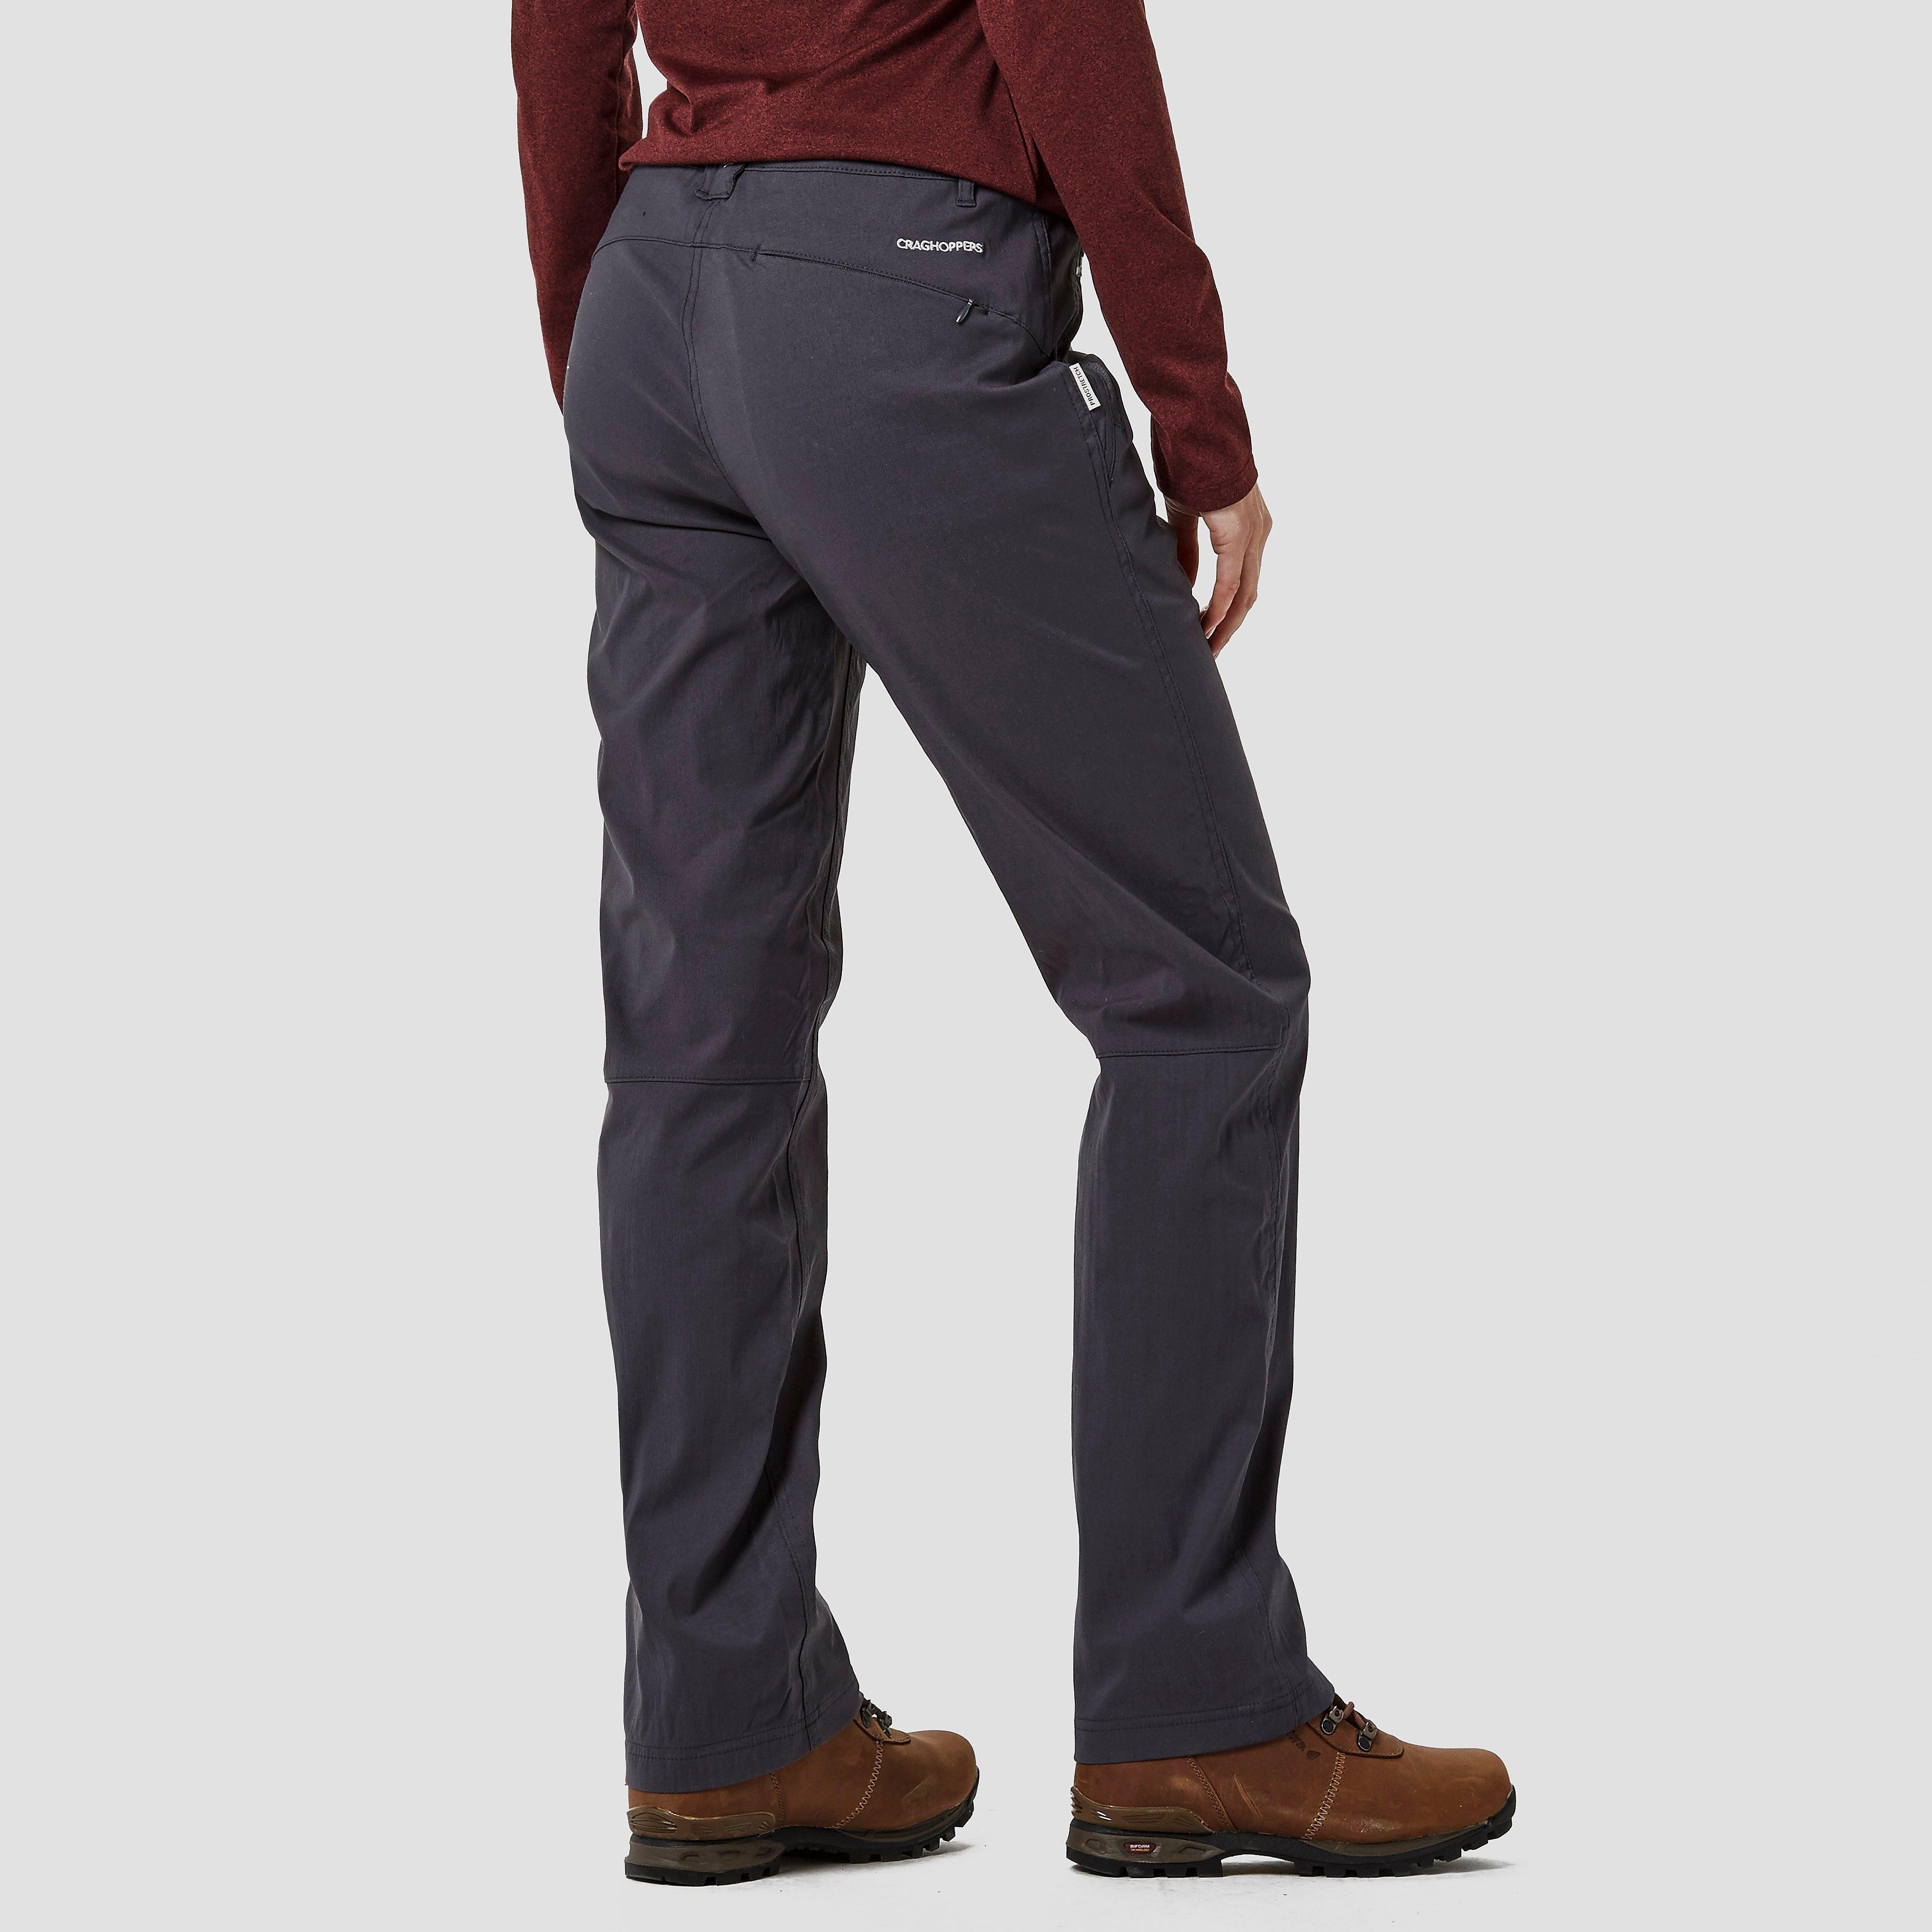 Craghoppers Kiwi Women's Trousers